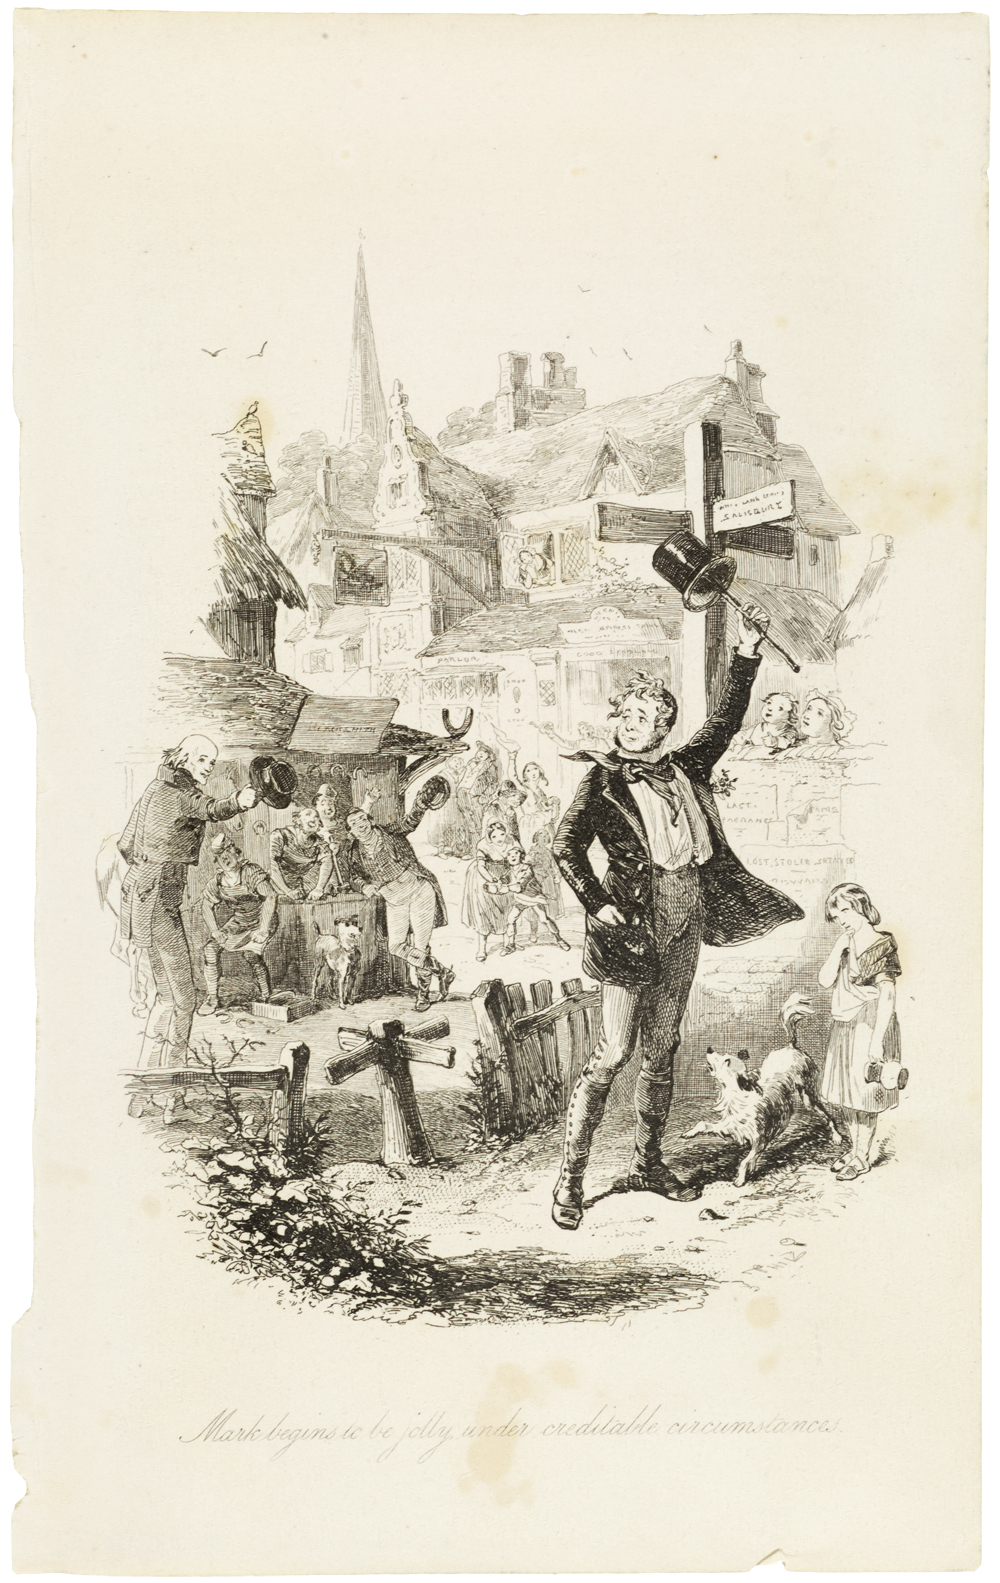 1000x1583 Illustrations For Dickens' Novels